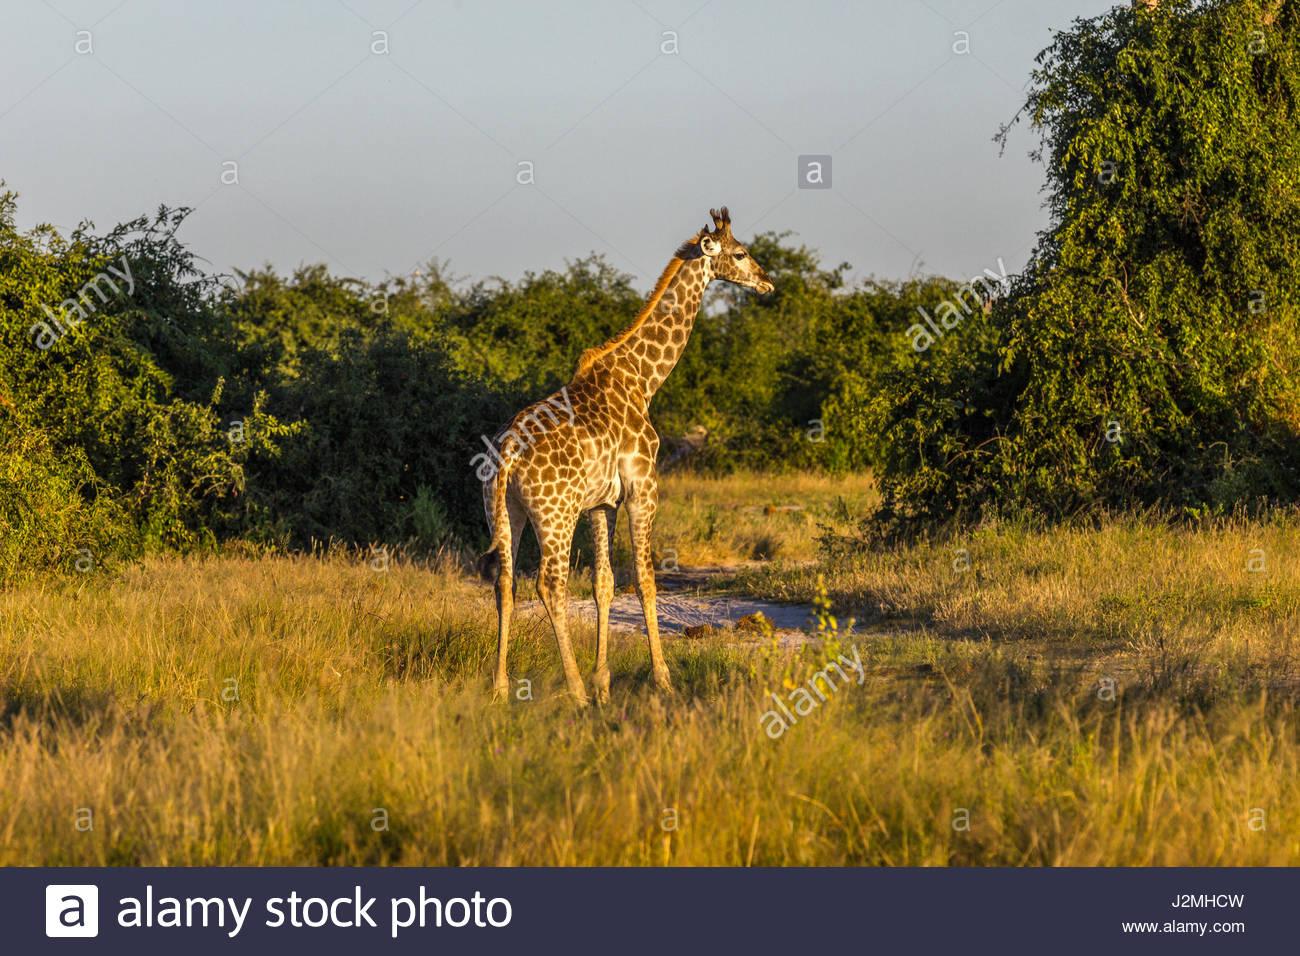 A lone Giraffe in the Chobe National Park, Botswana - Stock Image